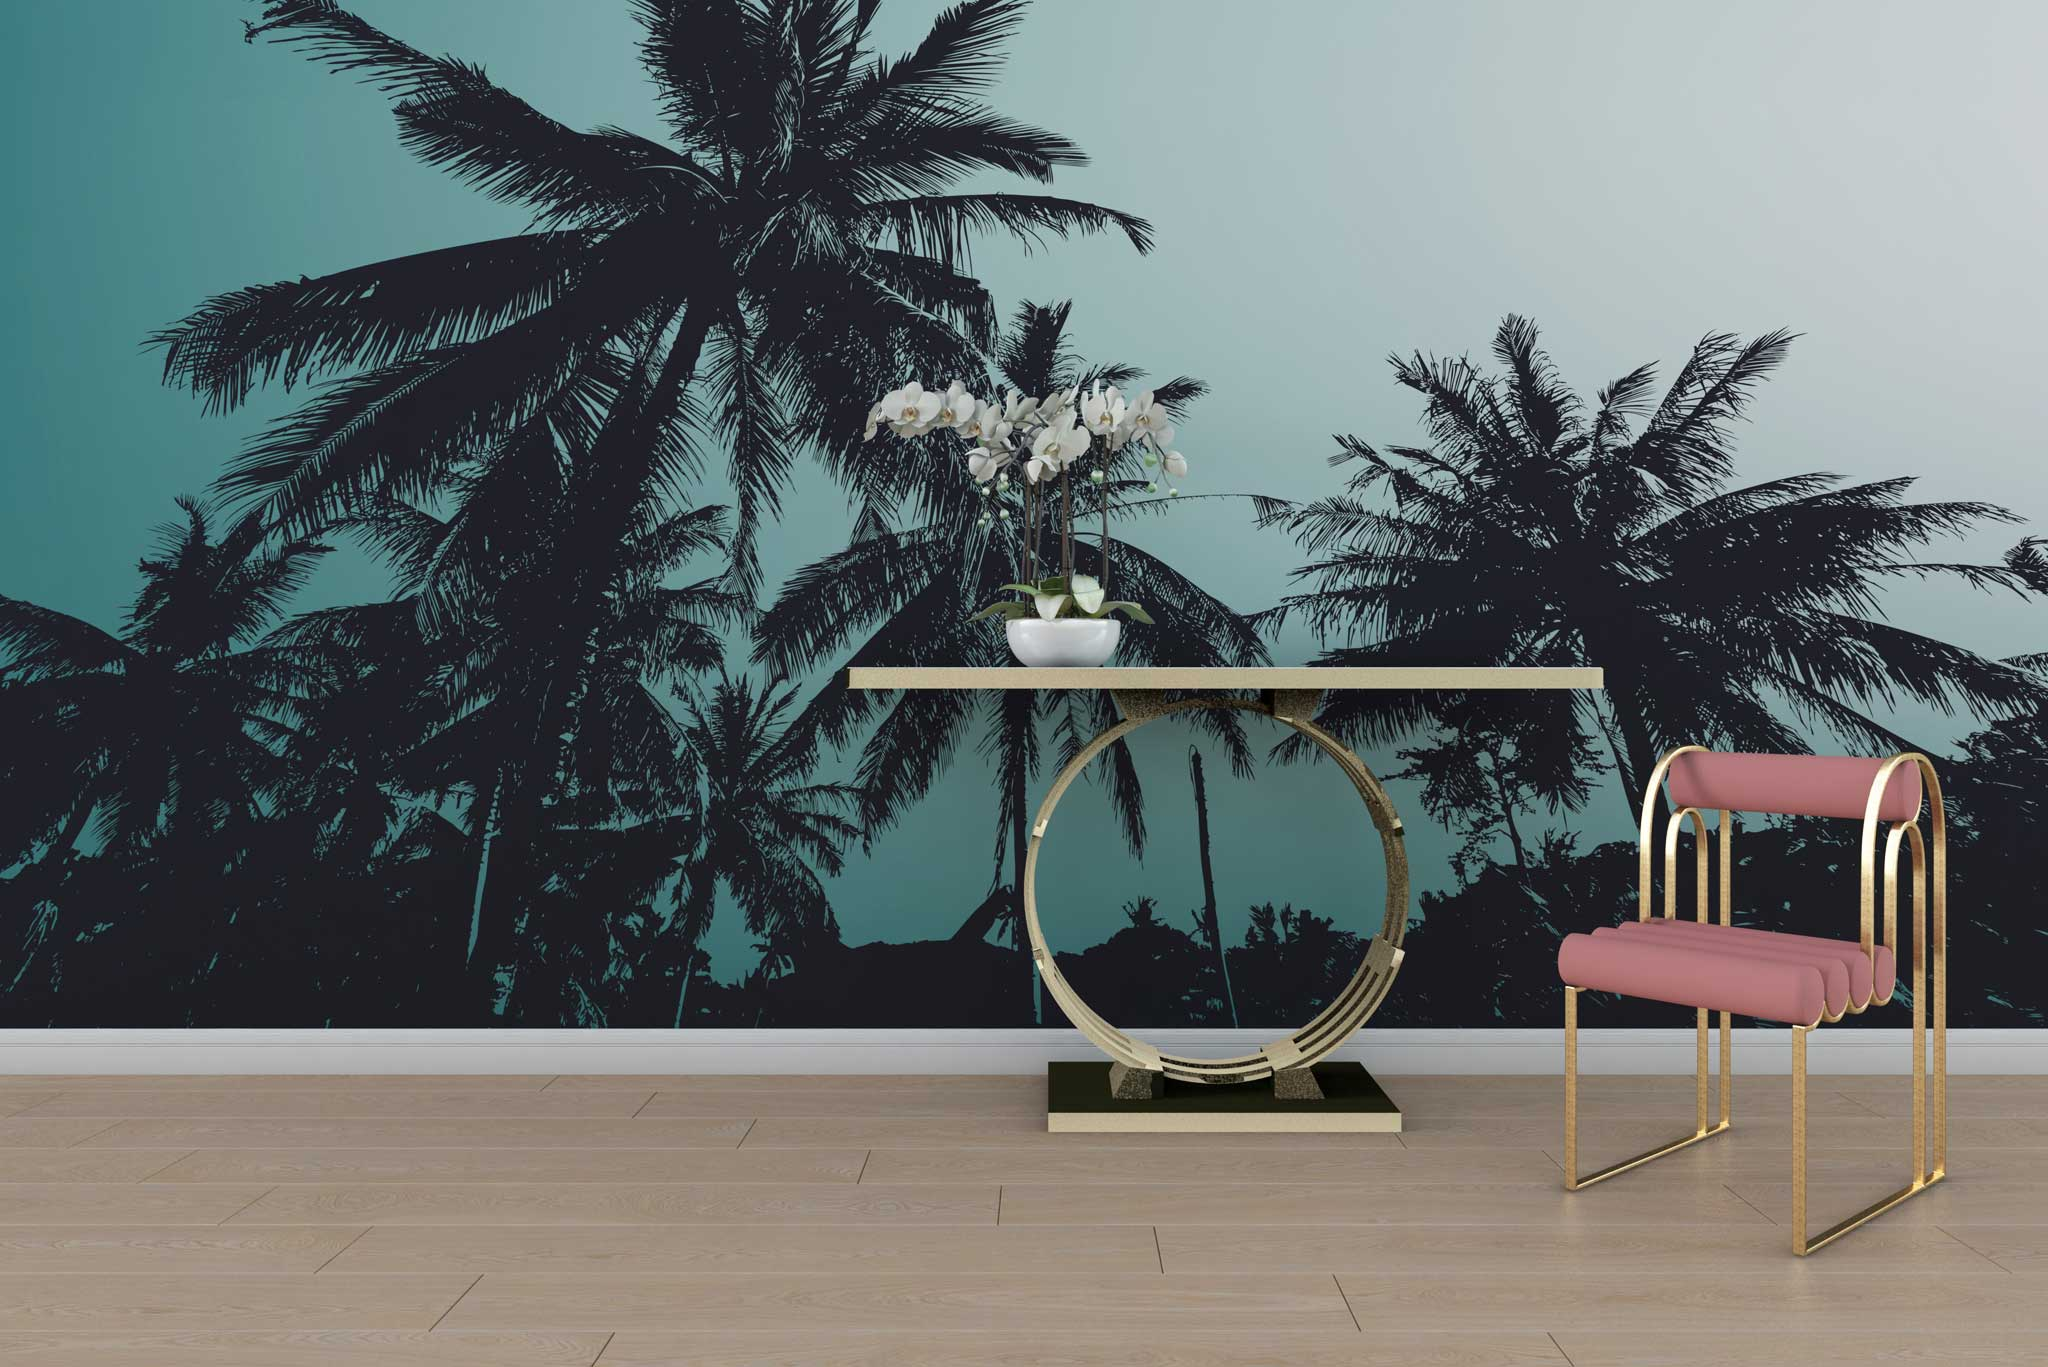 tapet-fototapet-special-personalizat-customizabil-comanda-bucuresti-daring-prints-model-fotografie-palmieri-fundal-cer-vara-exotic-tropical